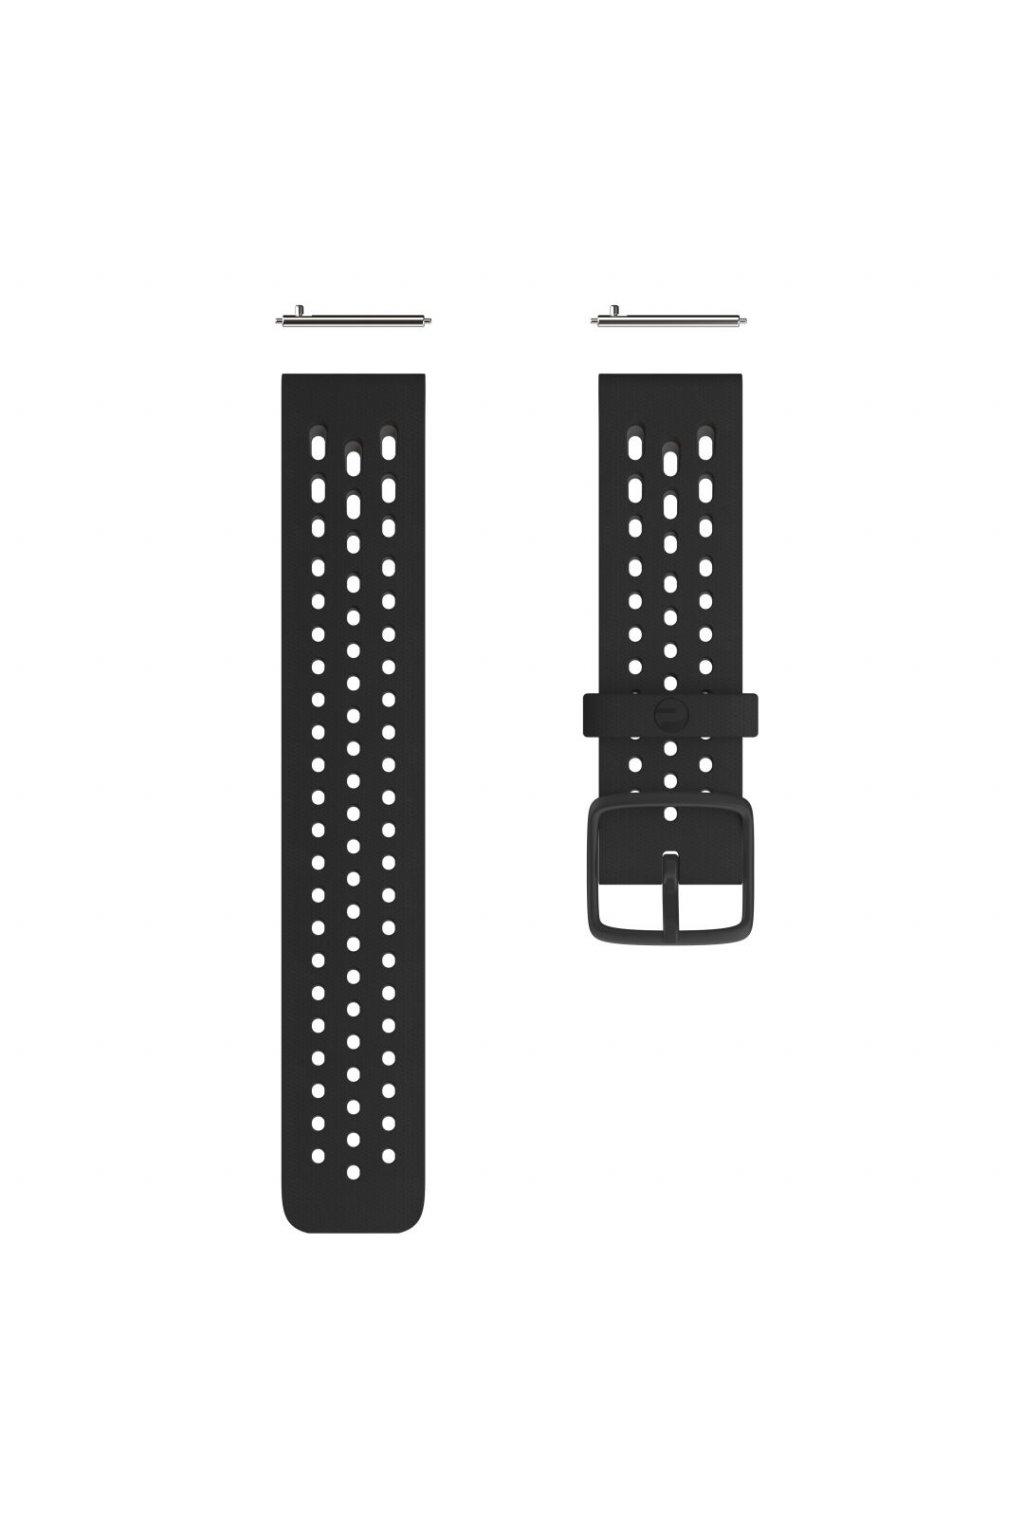 Polar Vantage M2 Accessory wristband front Black